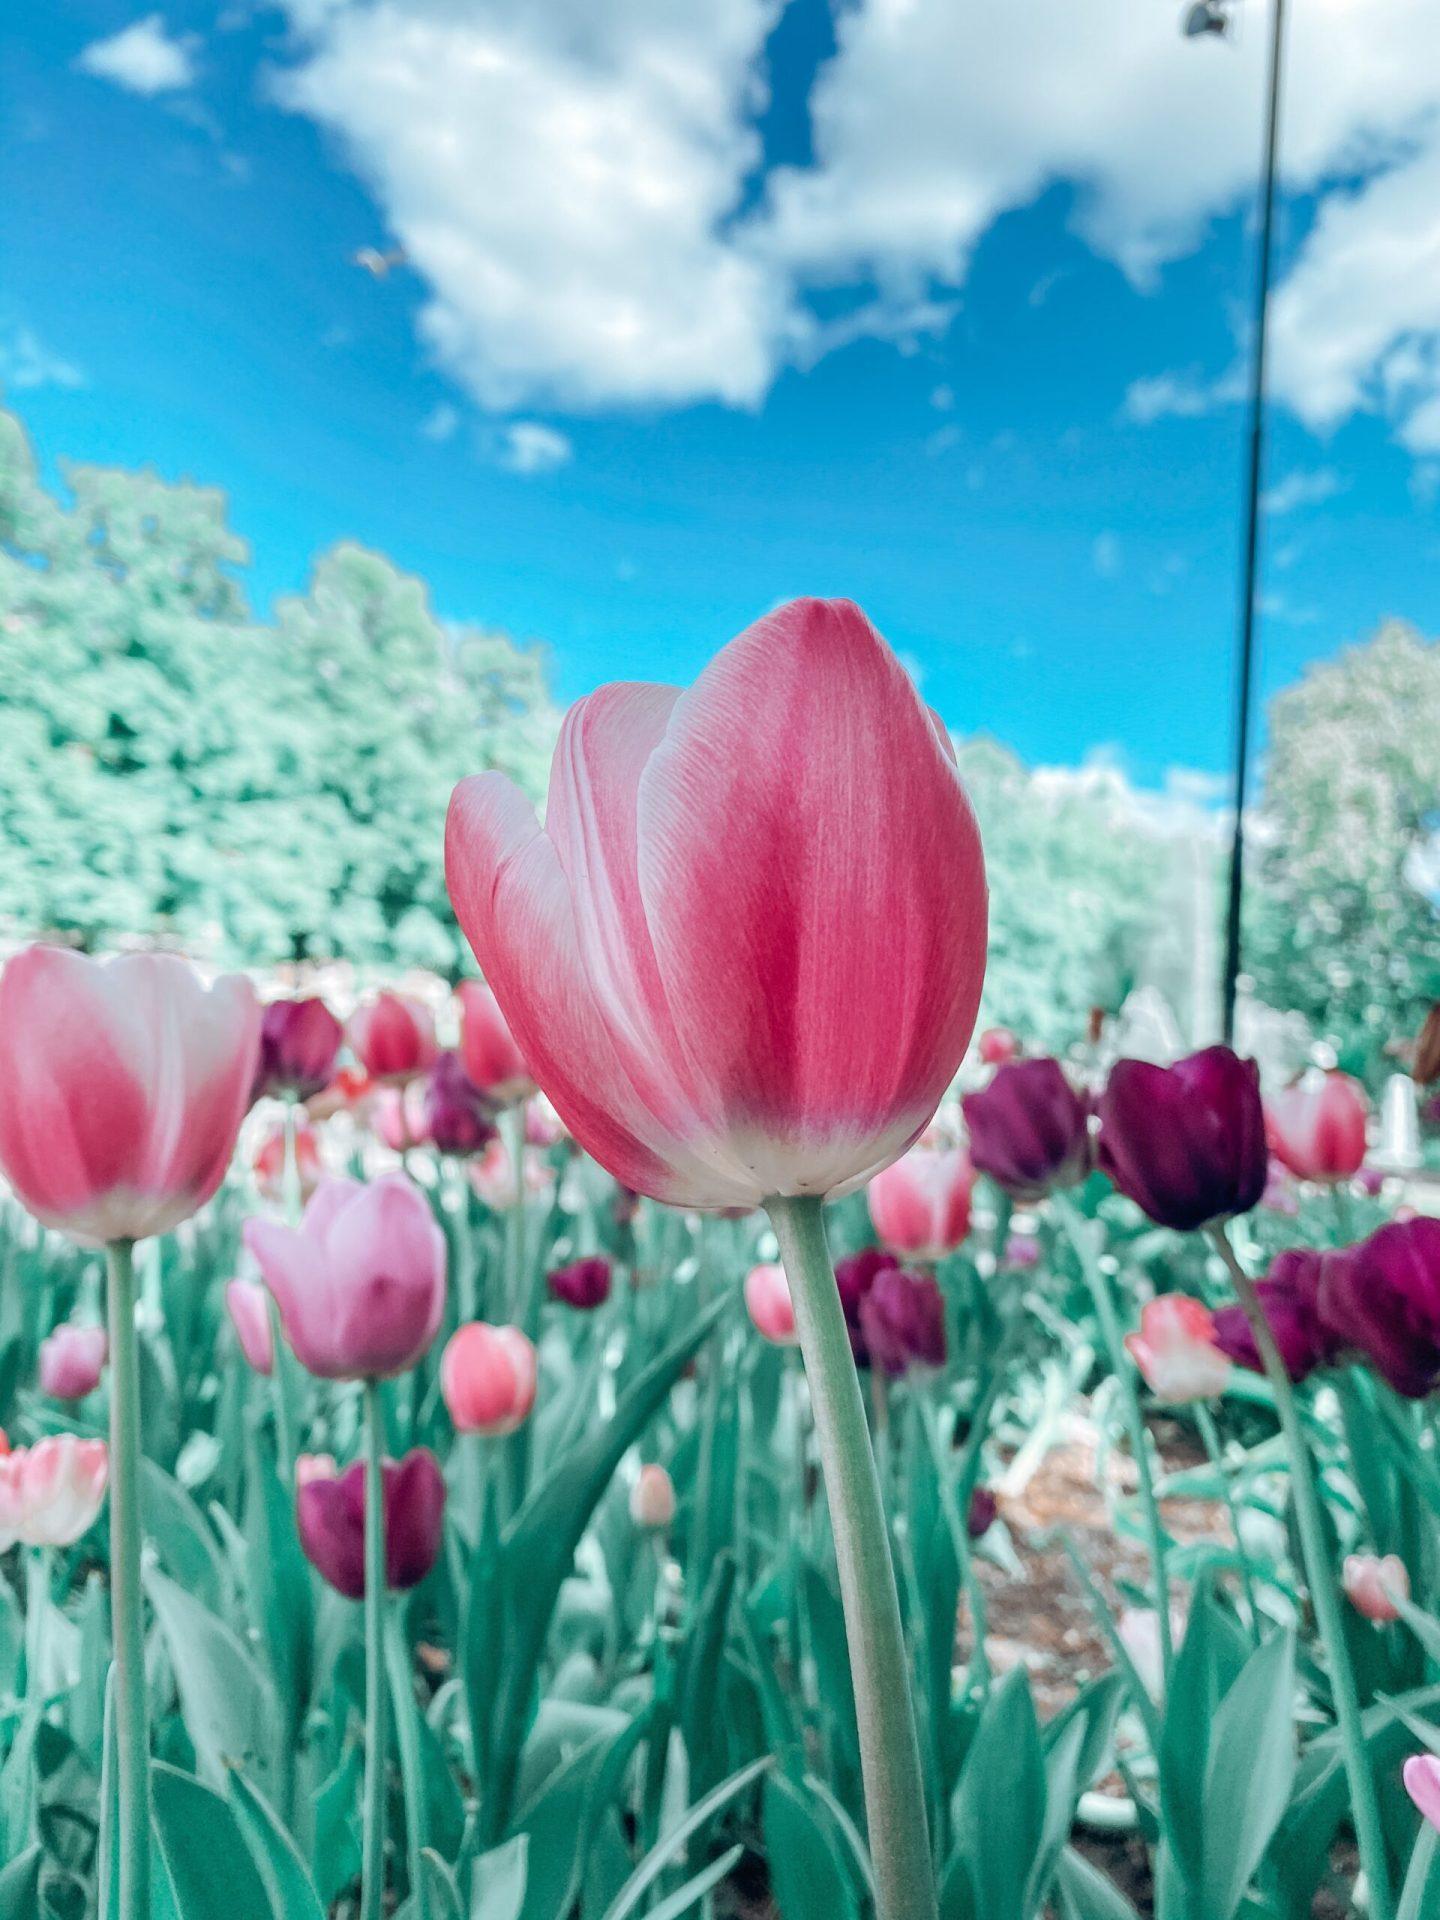 Flowers at Frogner Park